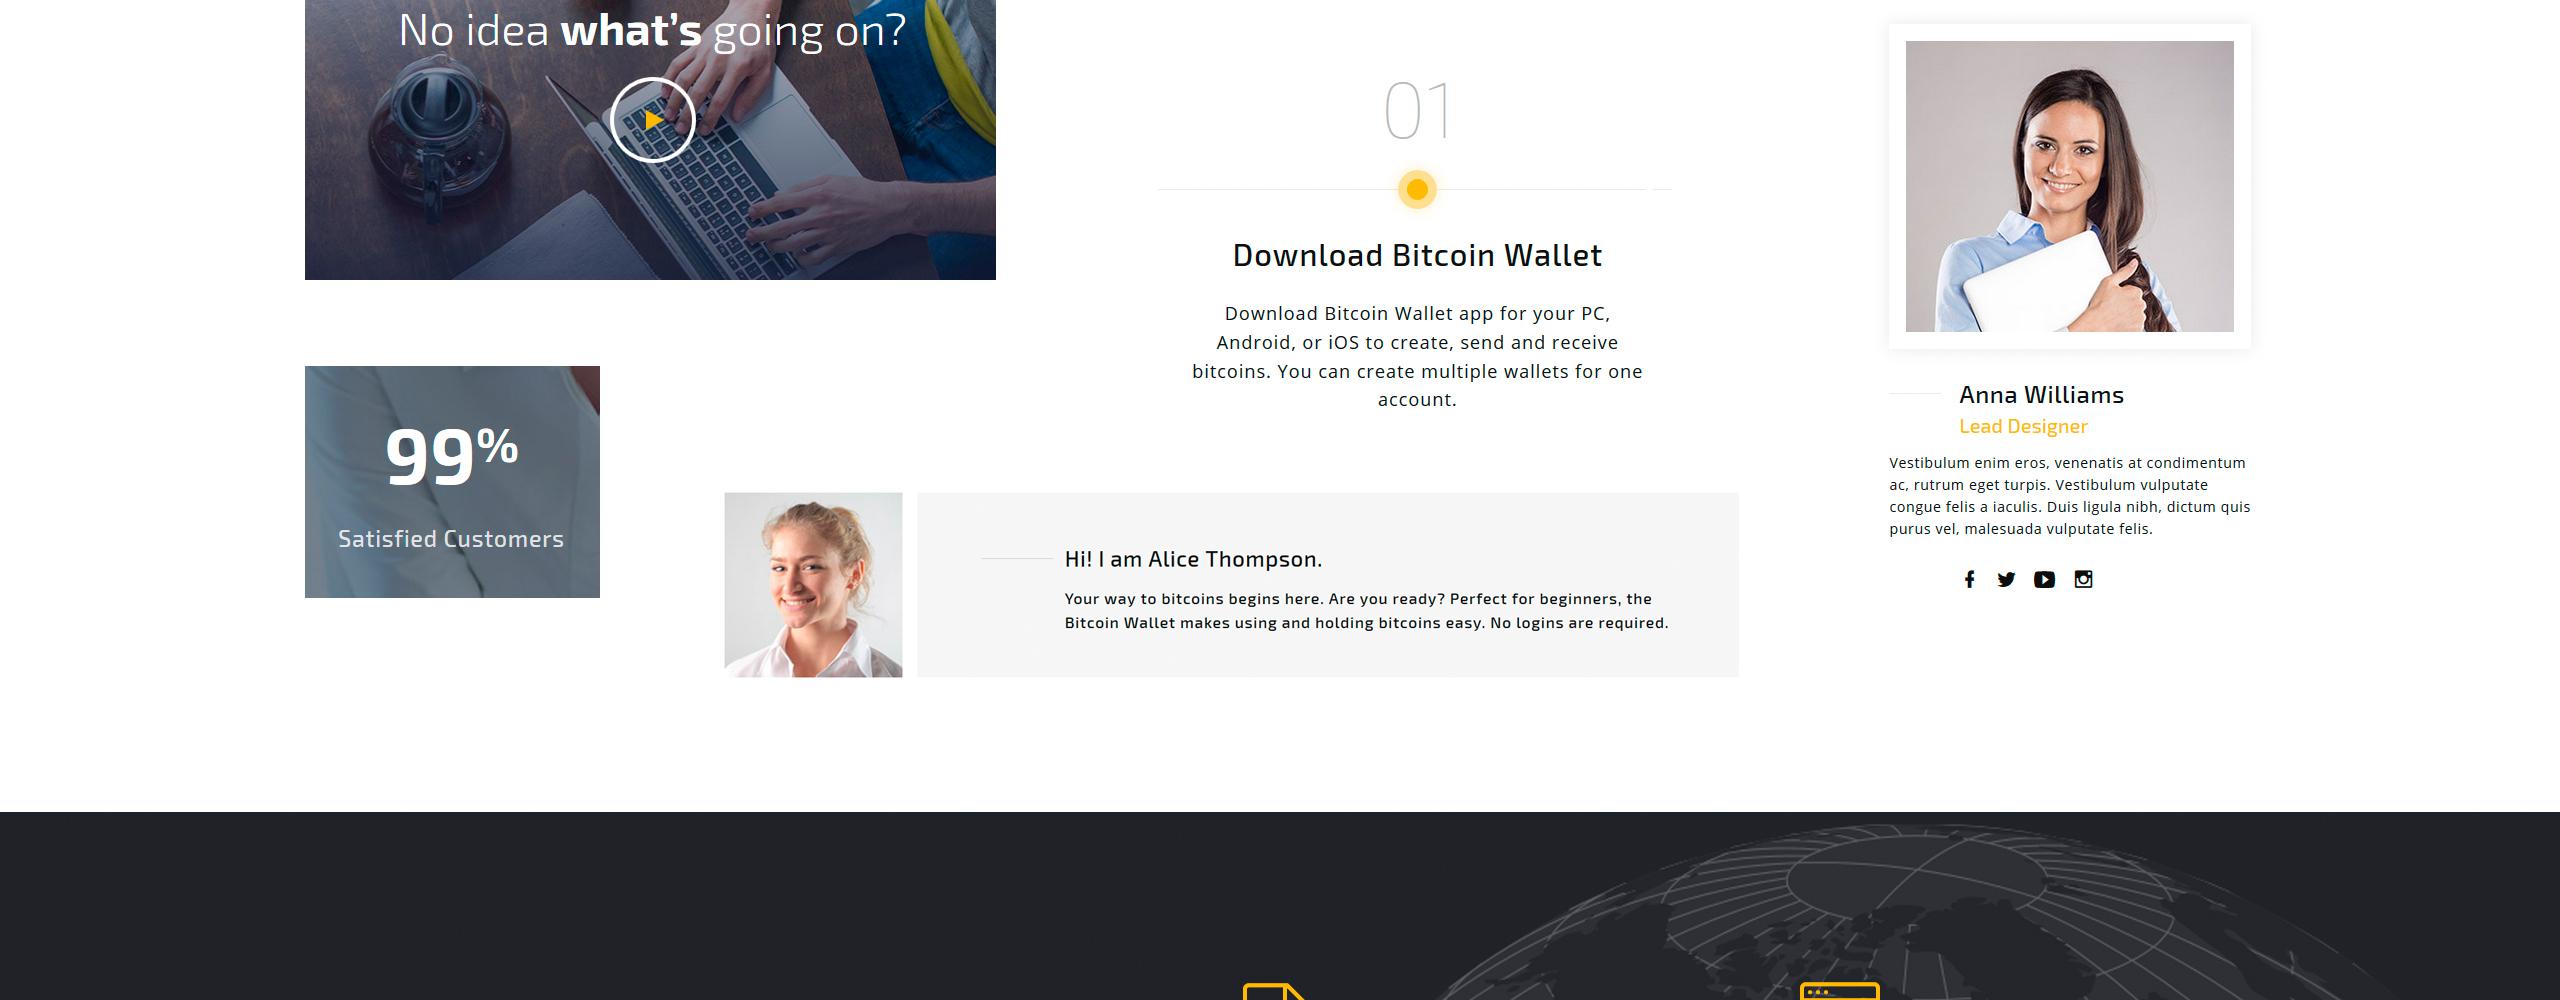 Bitcoin Landingspagina Template